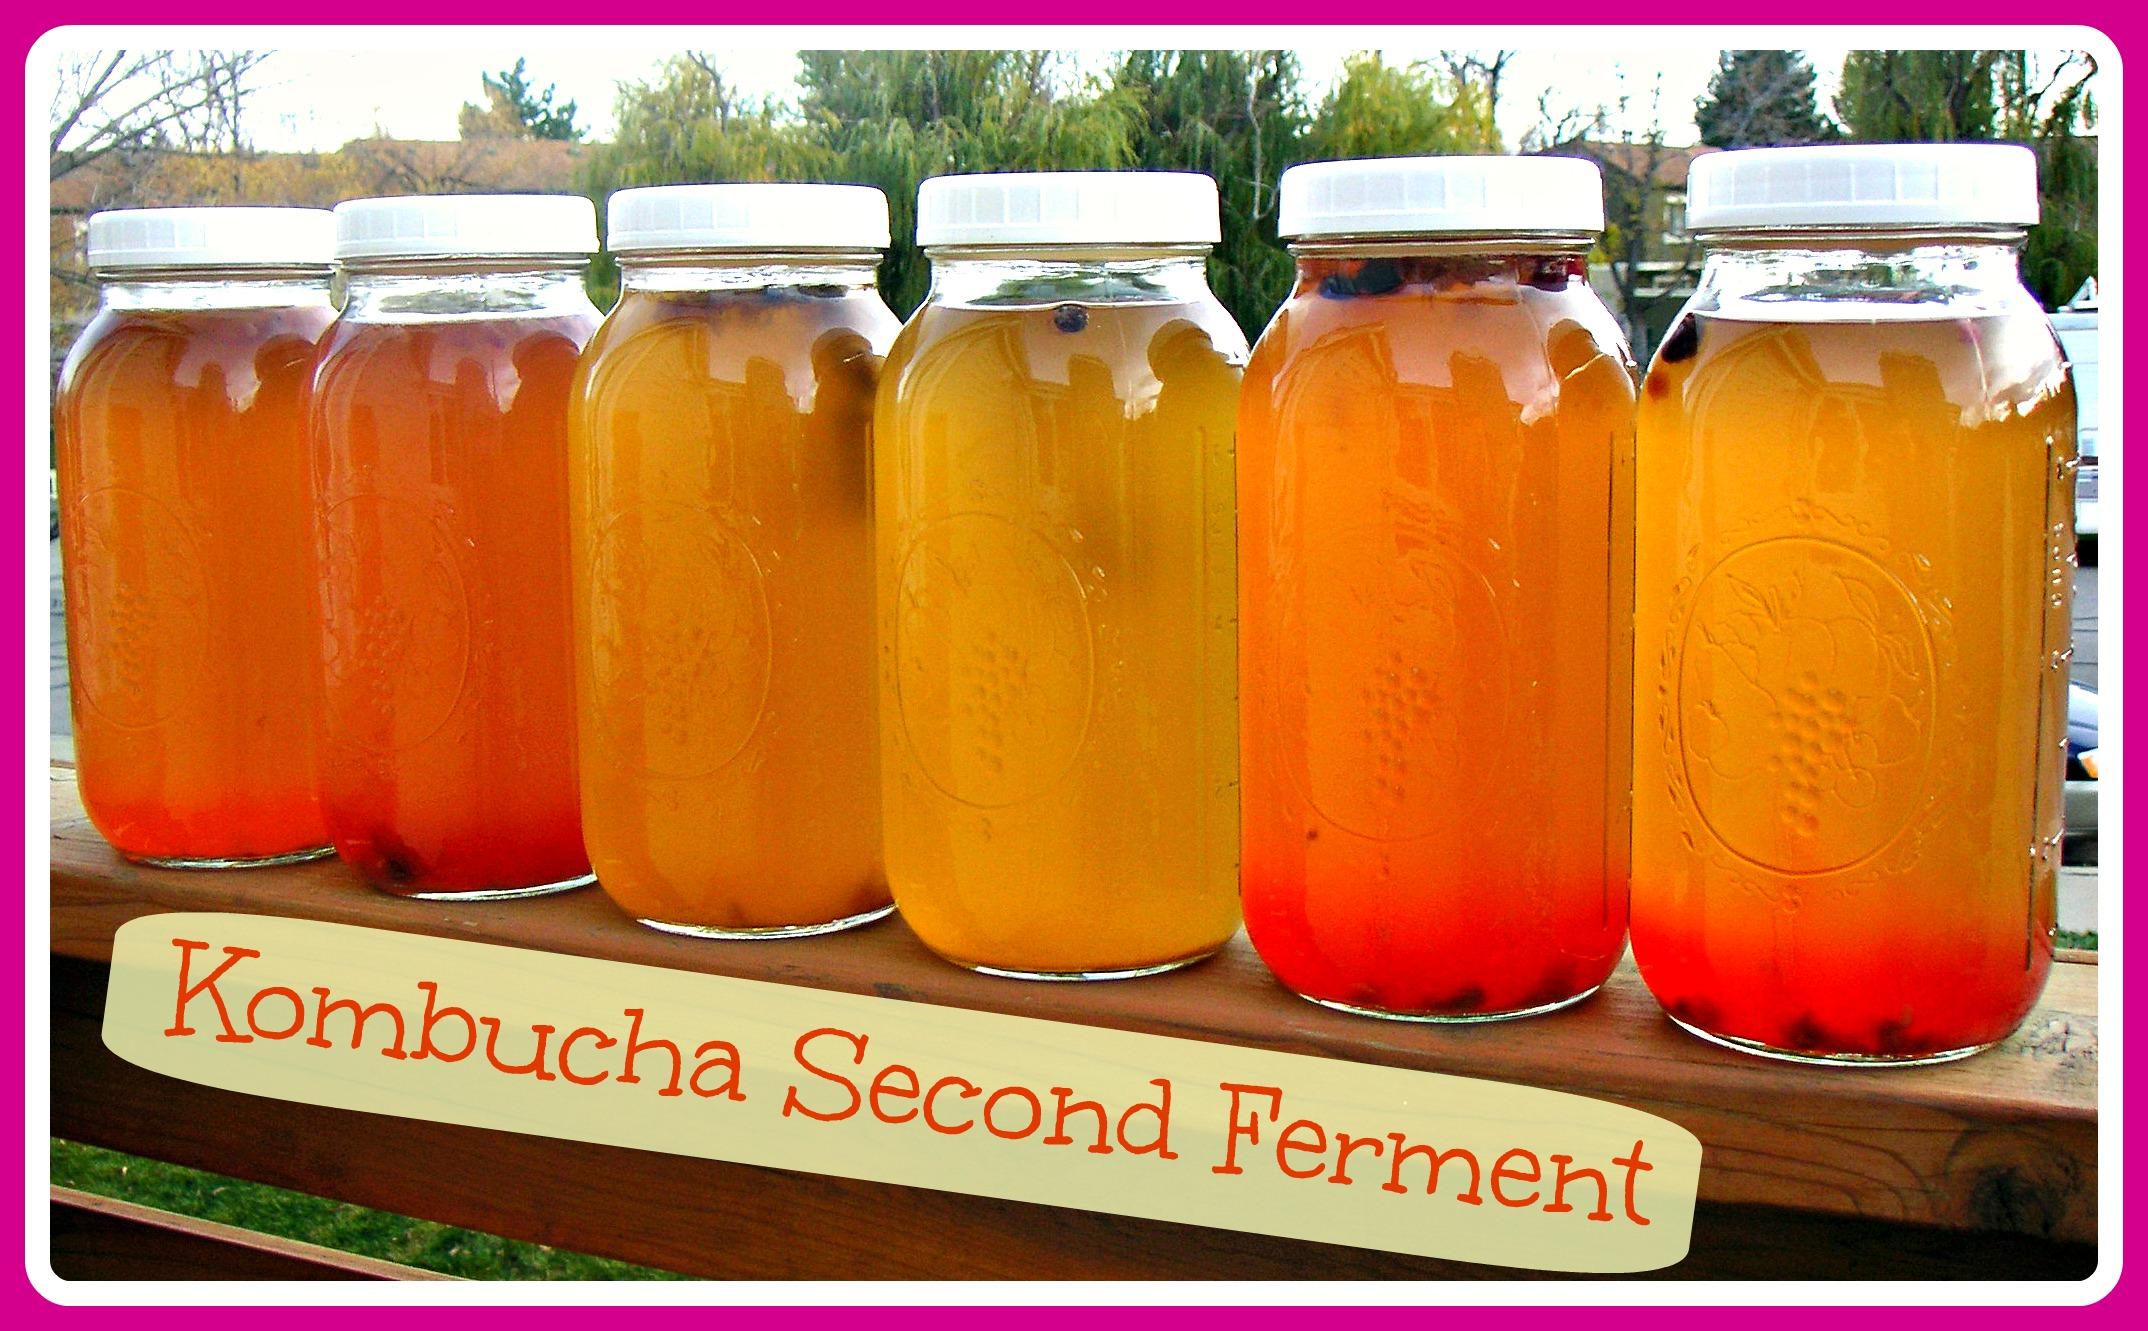 Kombucha-second-ferment.jpg